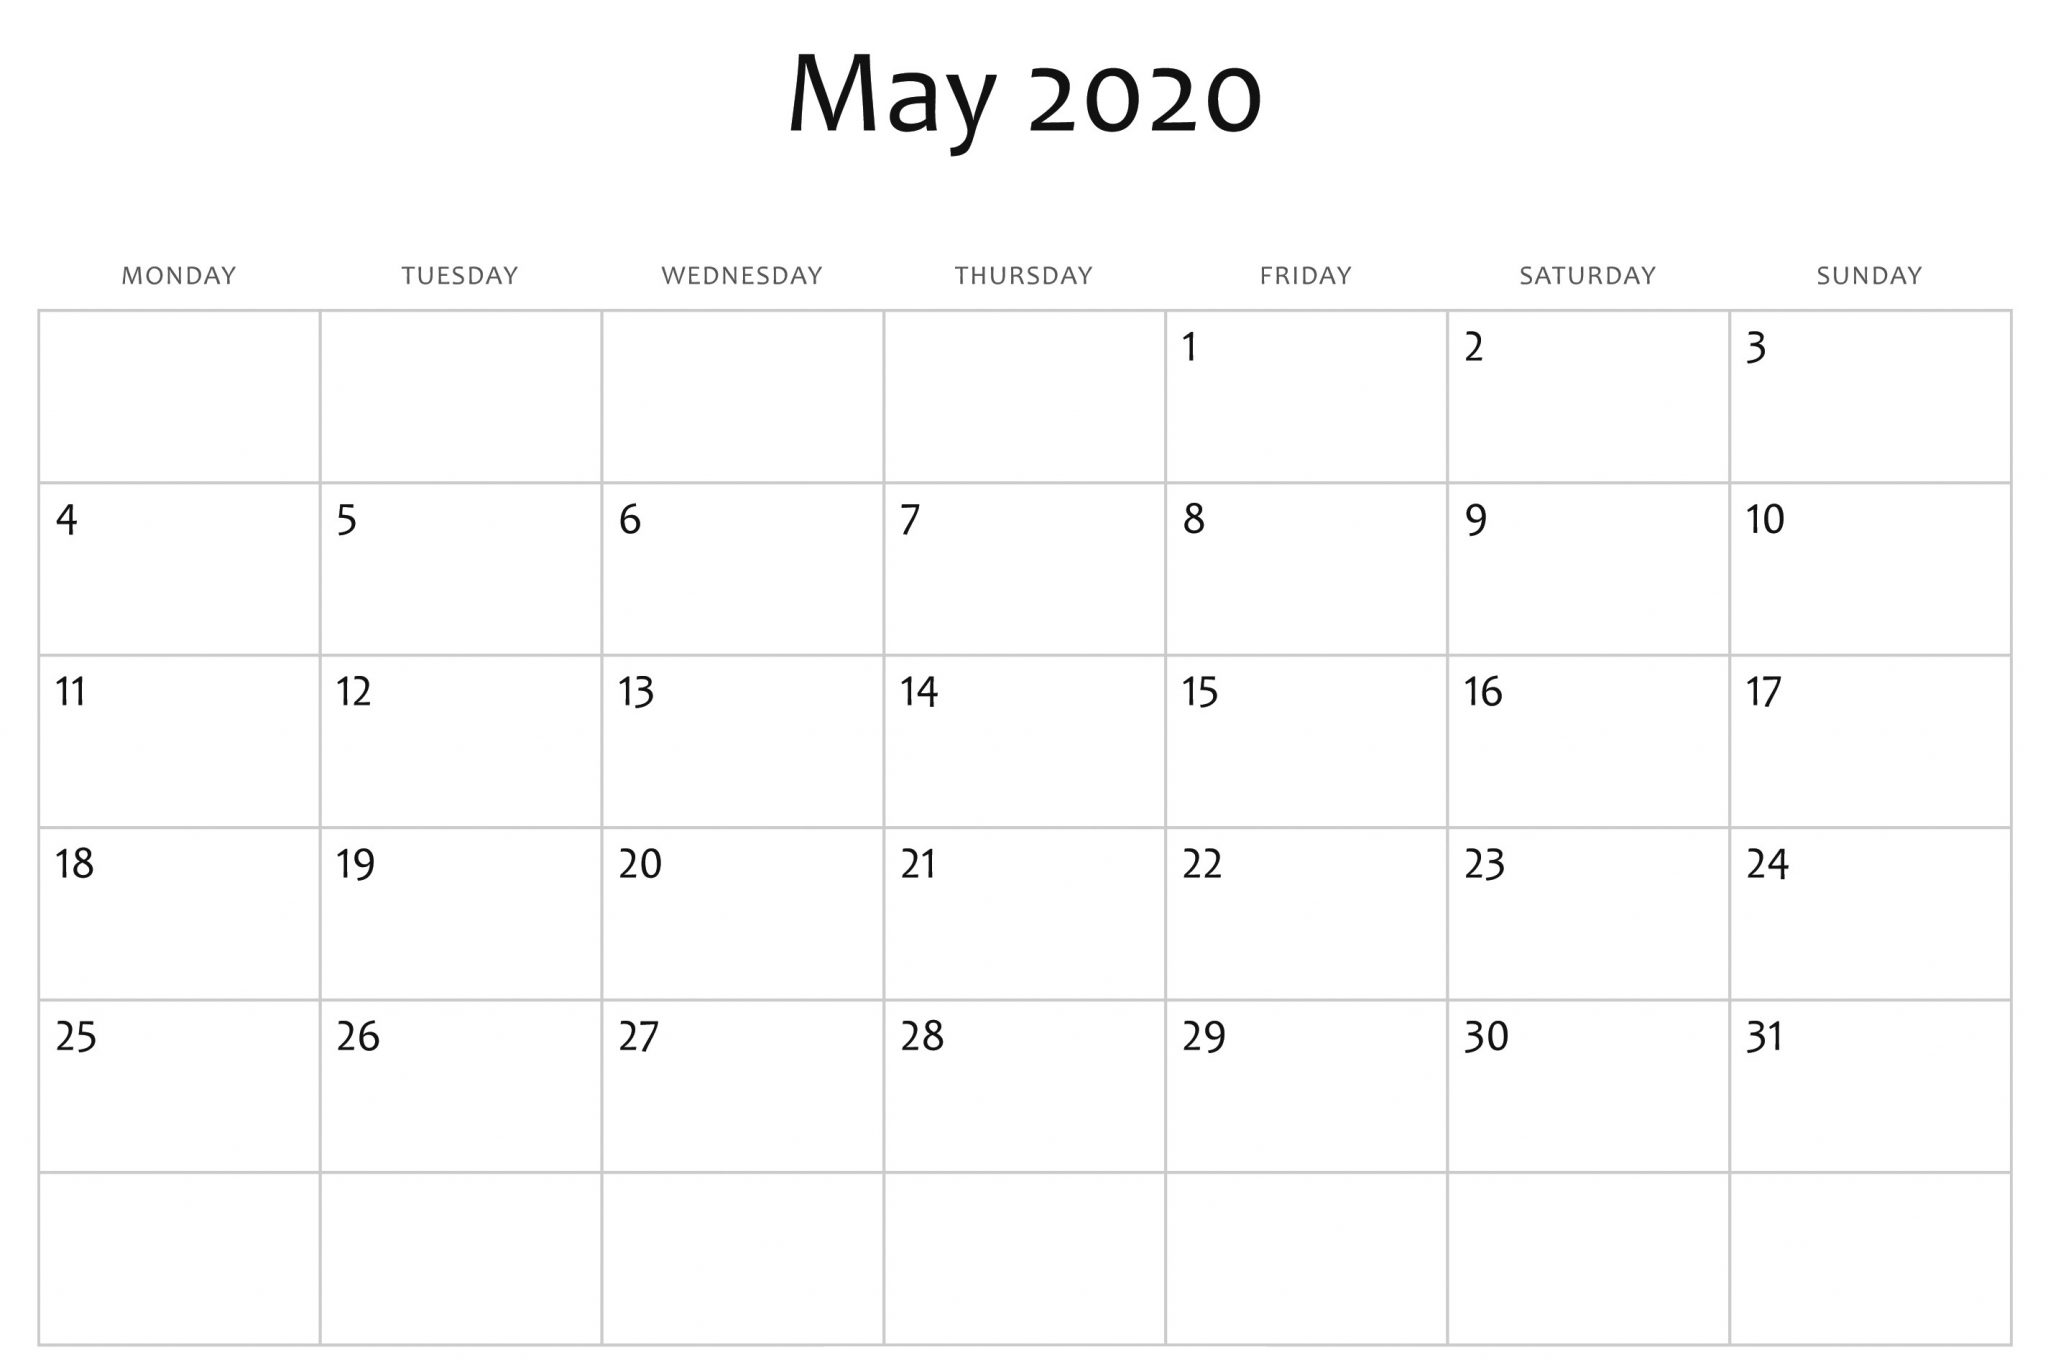 Free Editable May 2020 Calendar